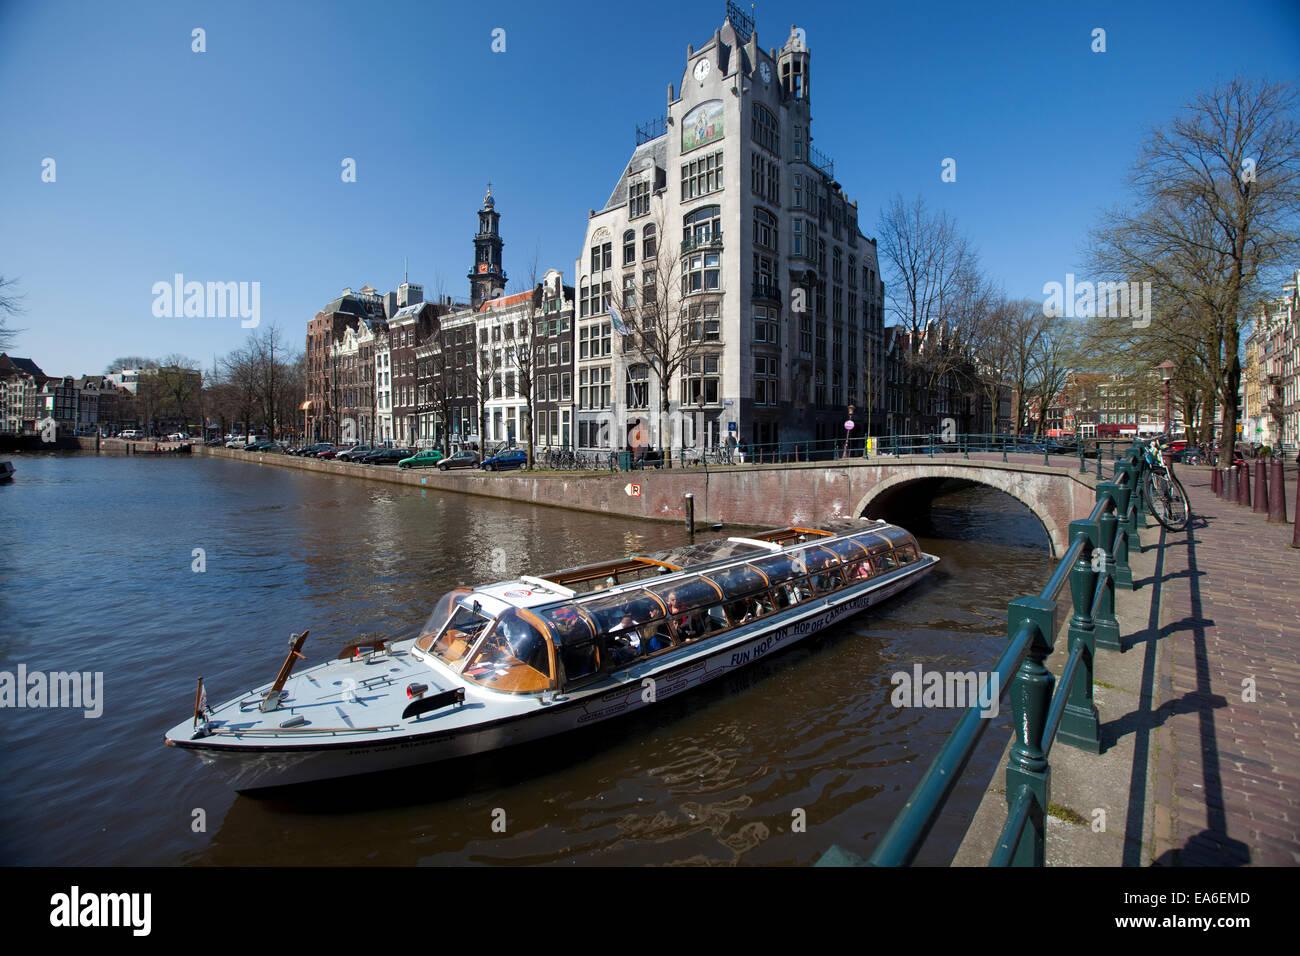 Niederlande, Amsterdam, Tourenboot am Kanal Stockbild